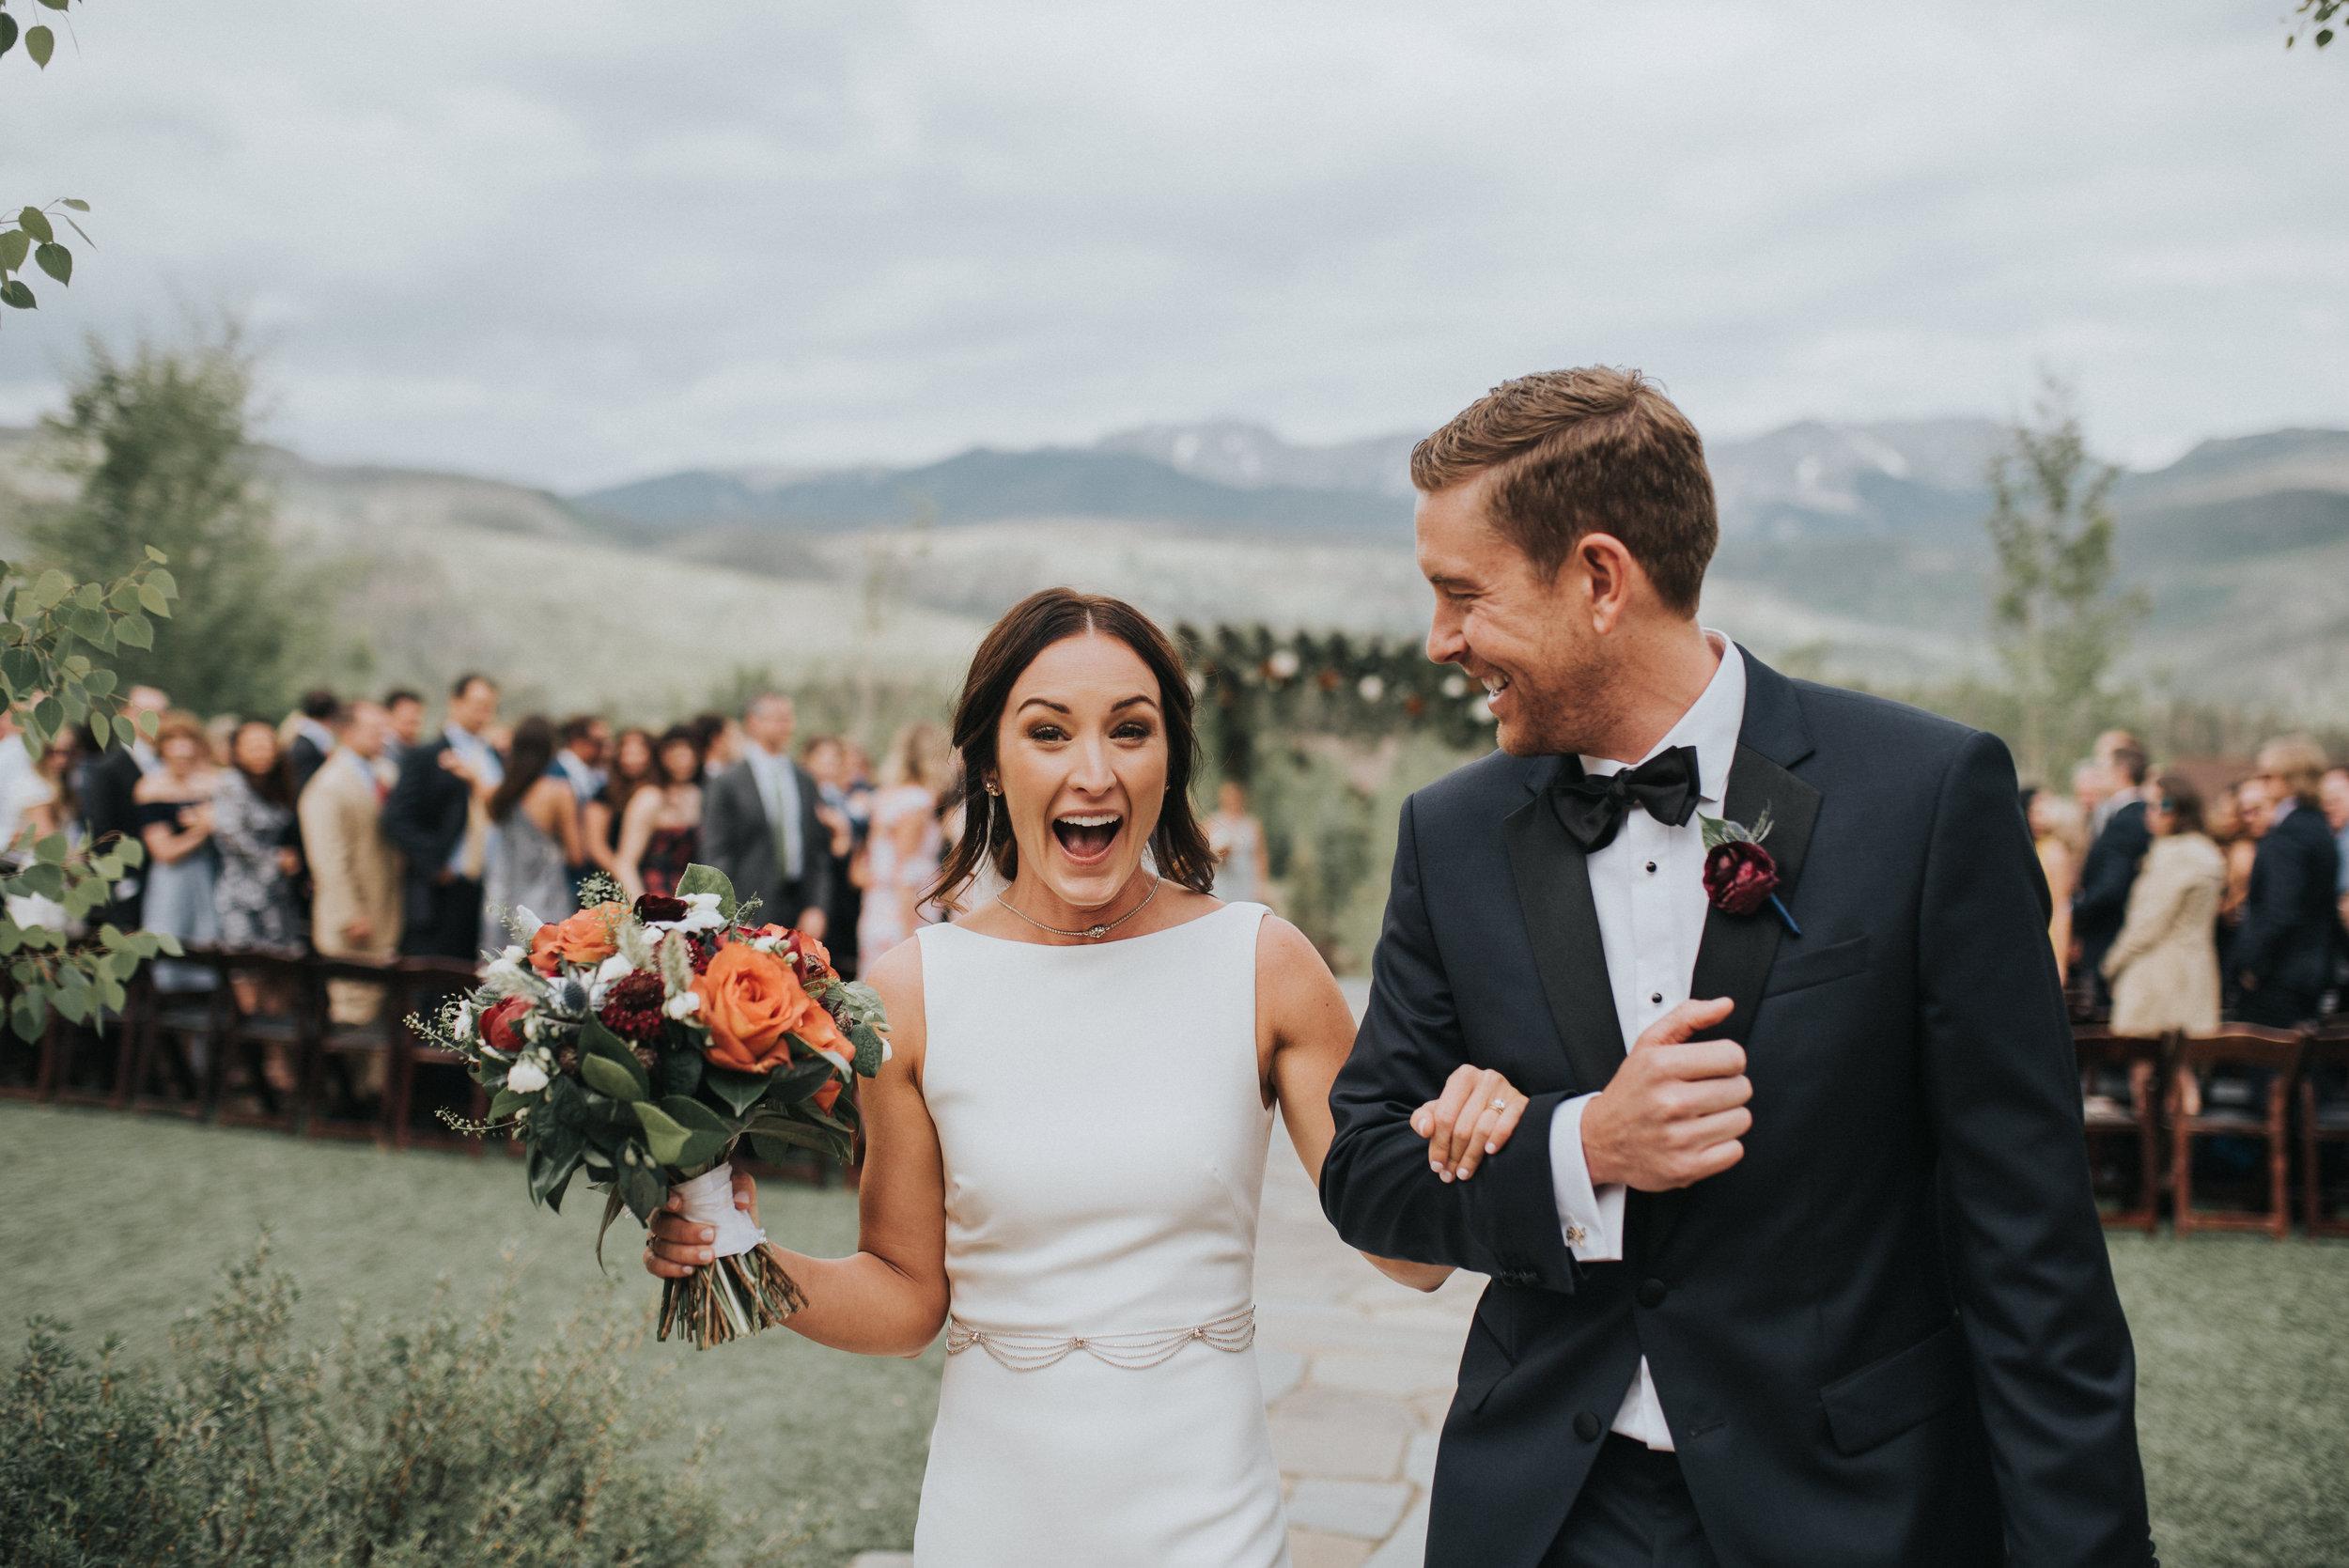 kristin-ryan-wedding-0731.jpg